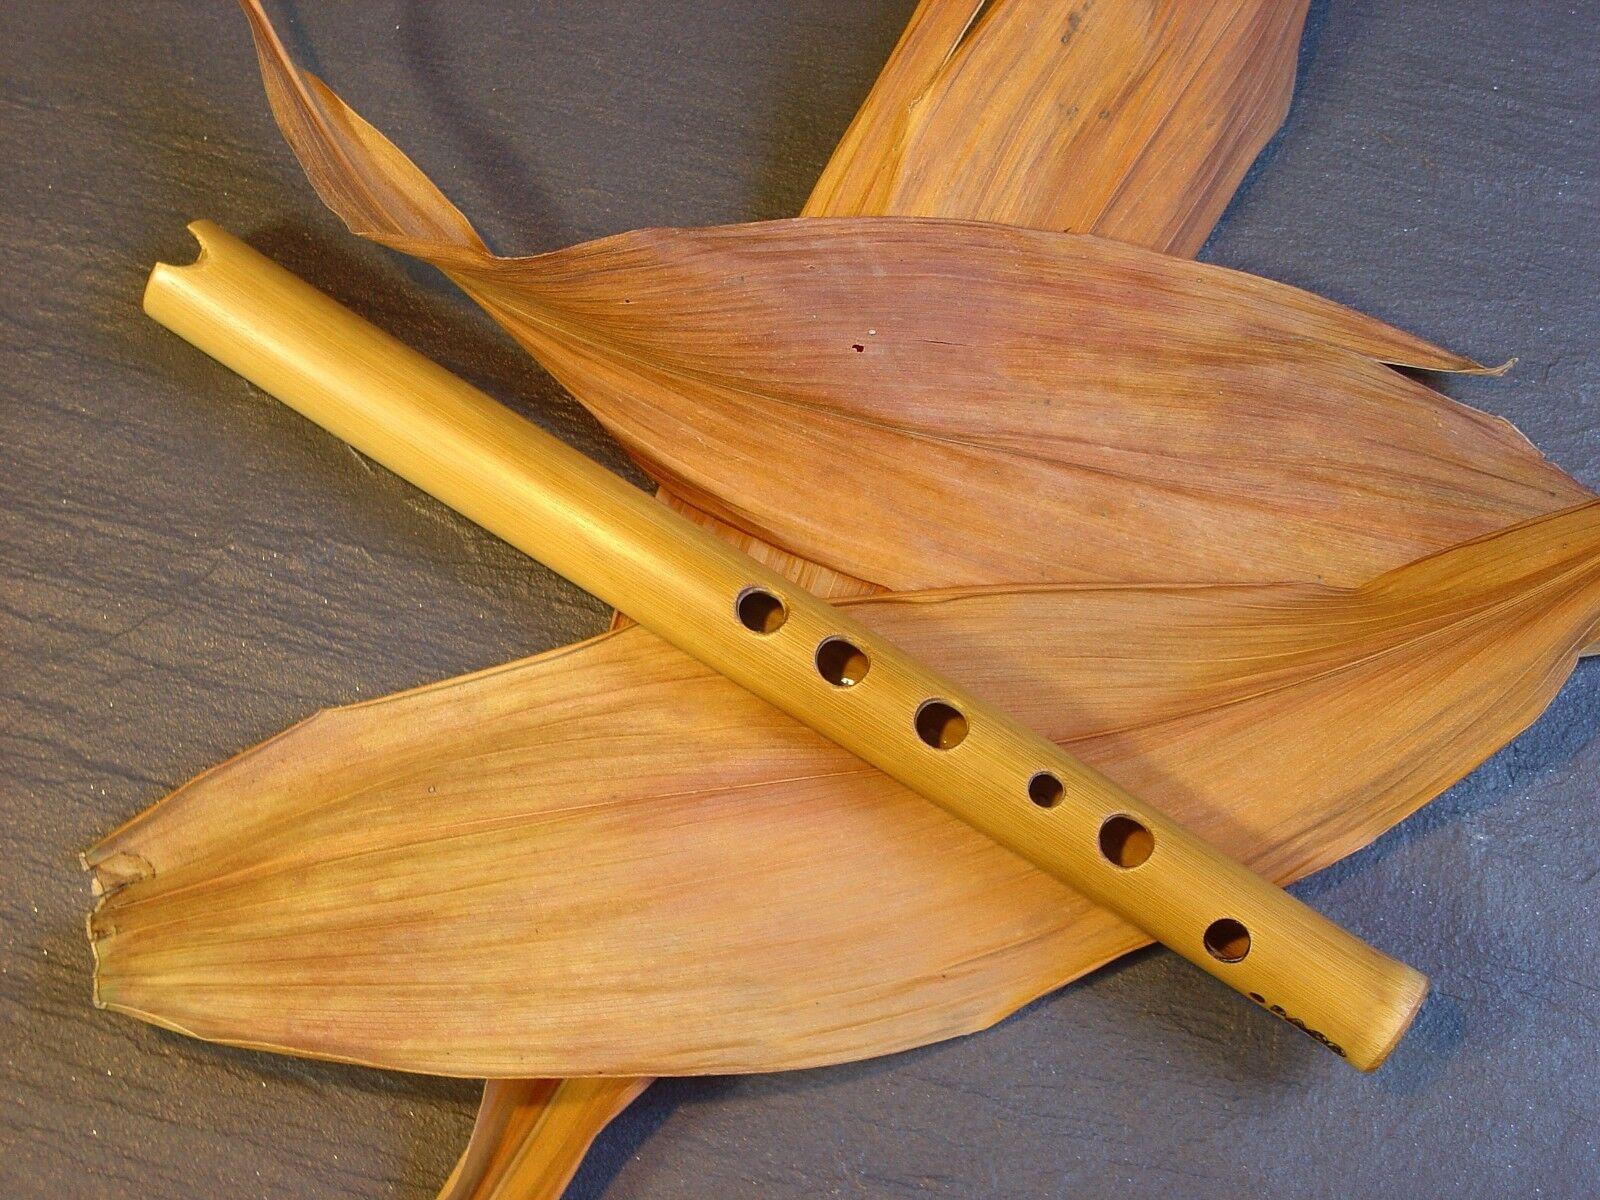 Quenali en Sib - Kenali - Quenilla - Quenita - Little Kena - Amazonia Quena